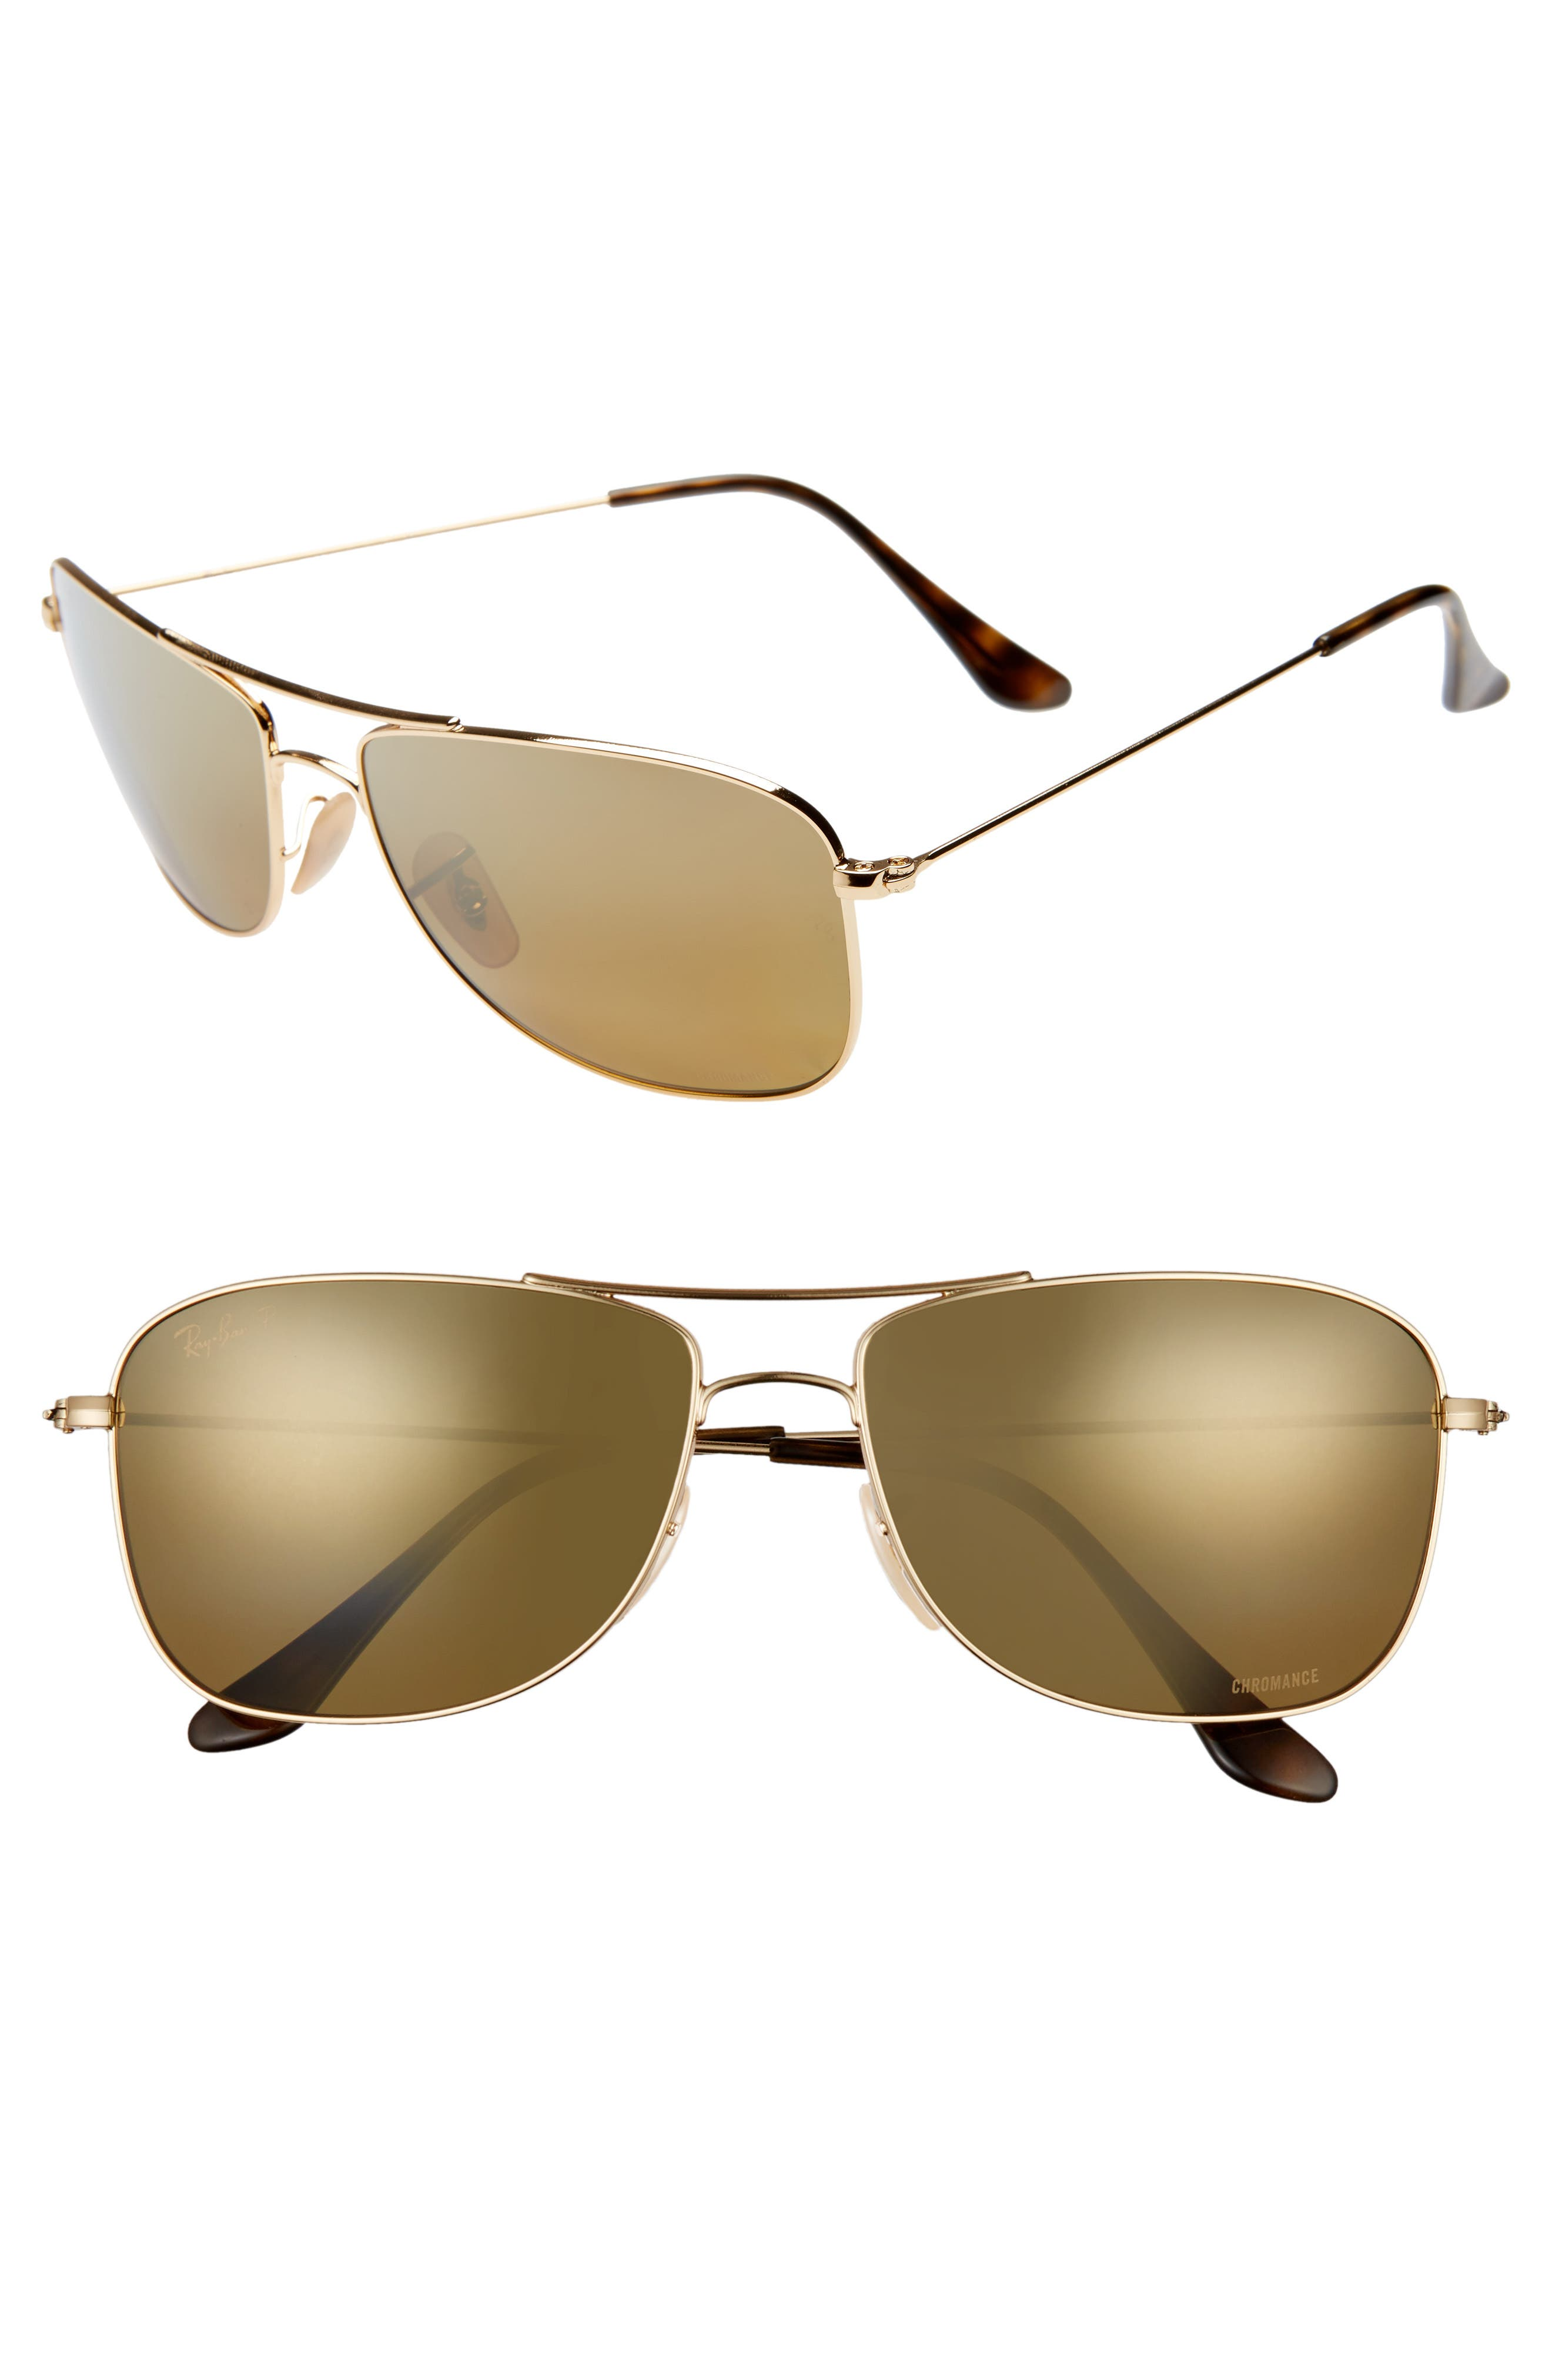 Ray-Ban 5m Chromance Aviator Sunglasses - Gold